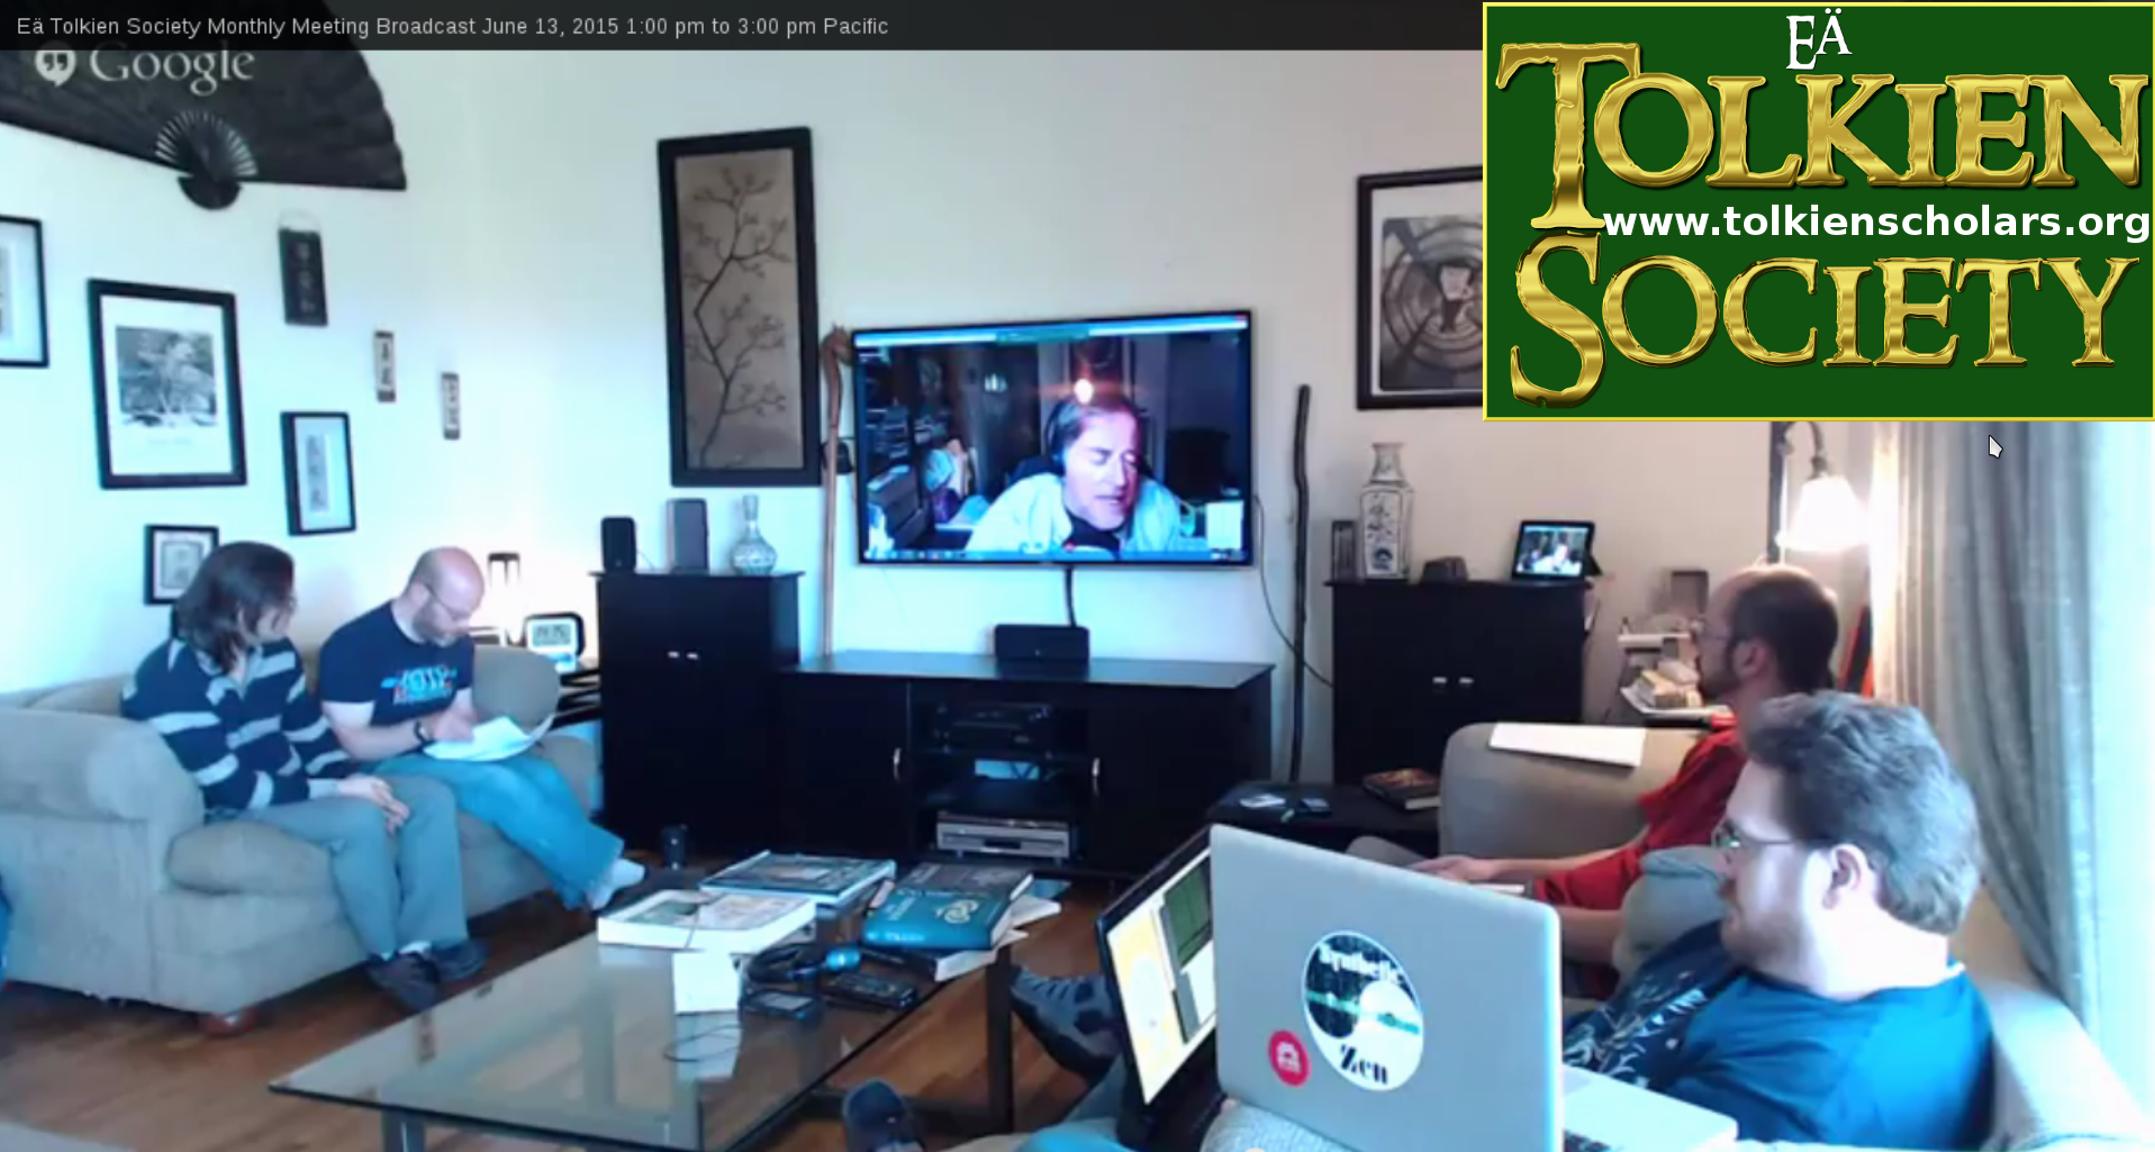 Reminder: Eä Tolkien Society March 12th, 2016 Meeting